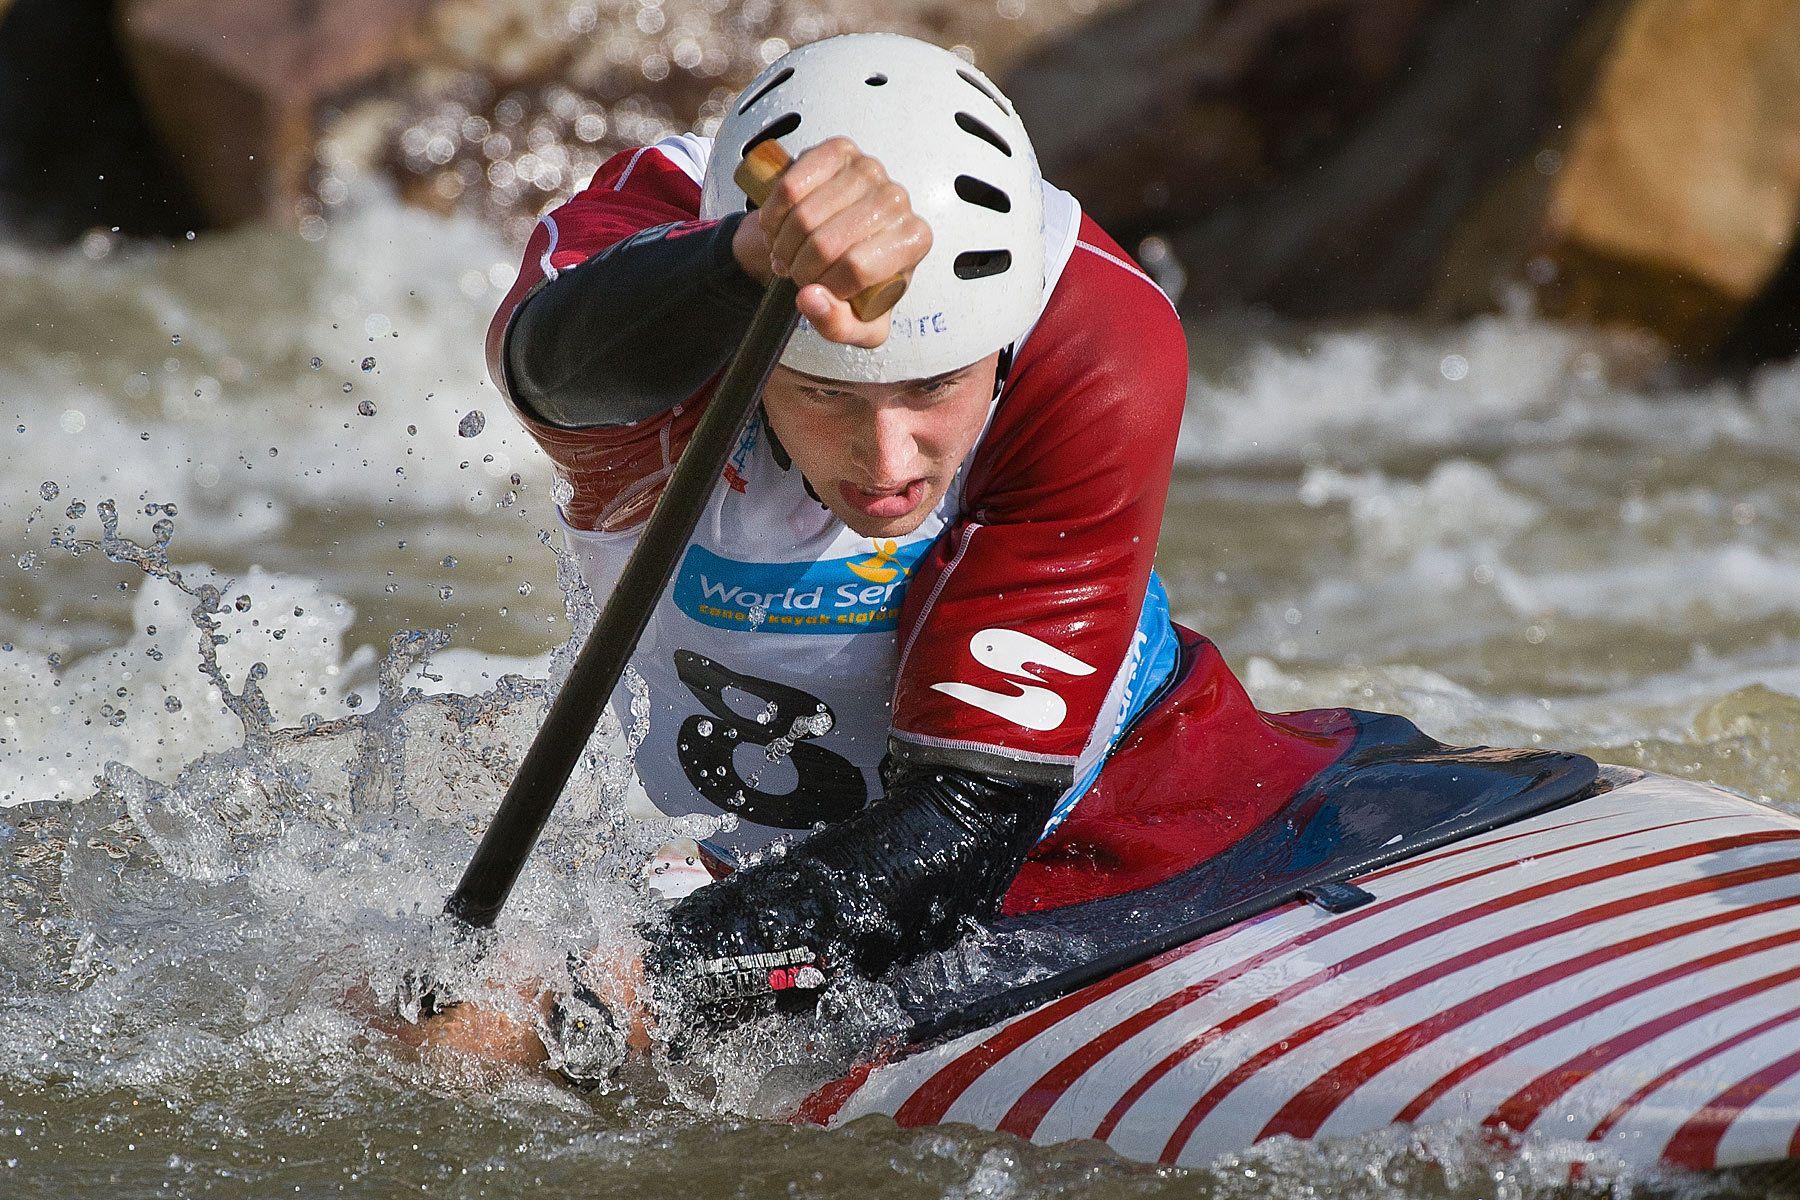 1c_1_slalom_race